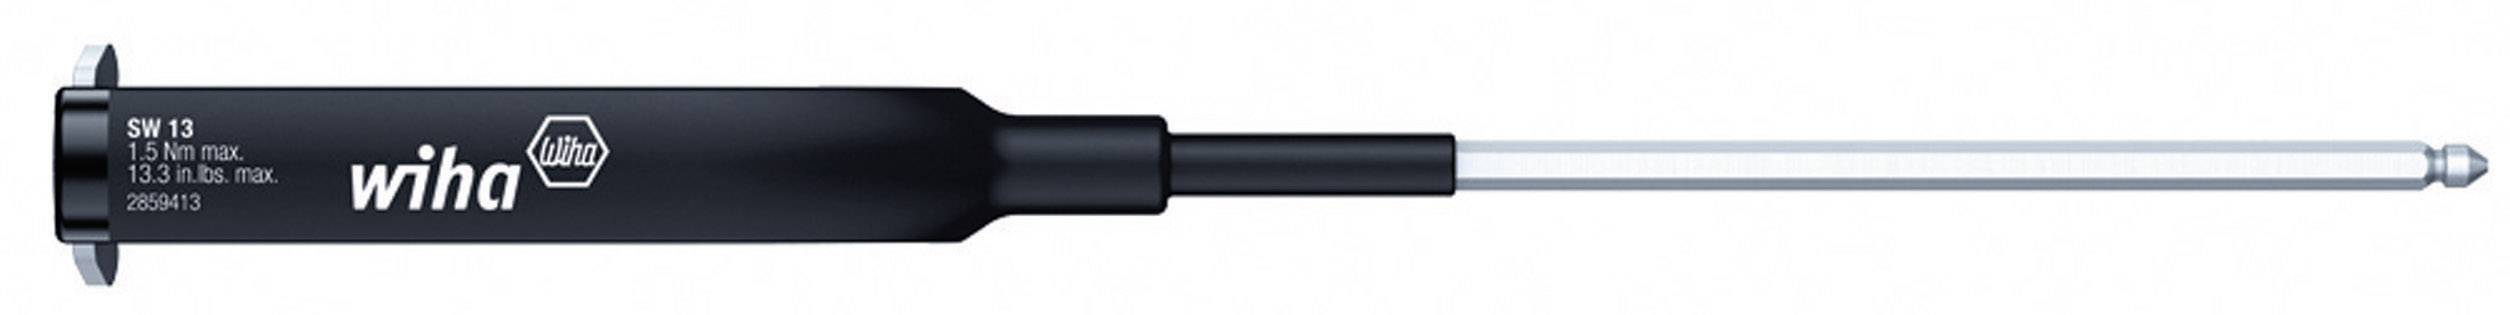 Bit momentového kľúča Wiha Torque 2859 36413, 218 mm